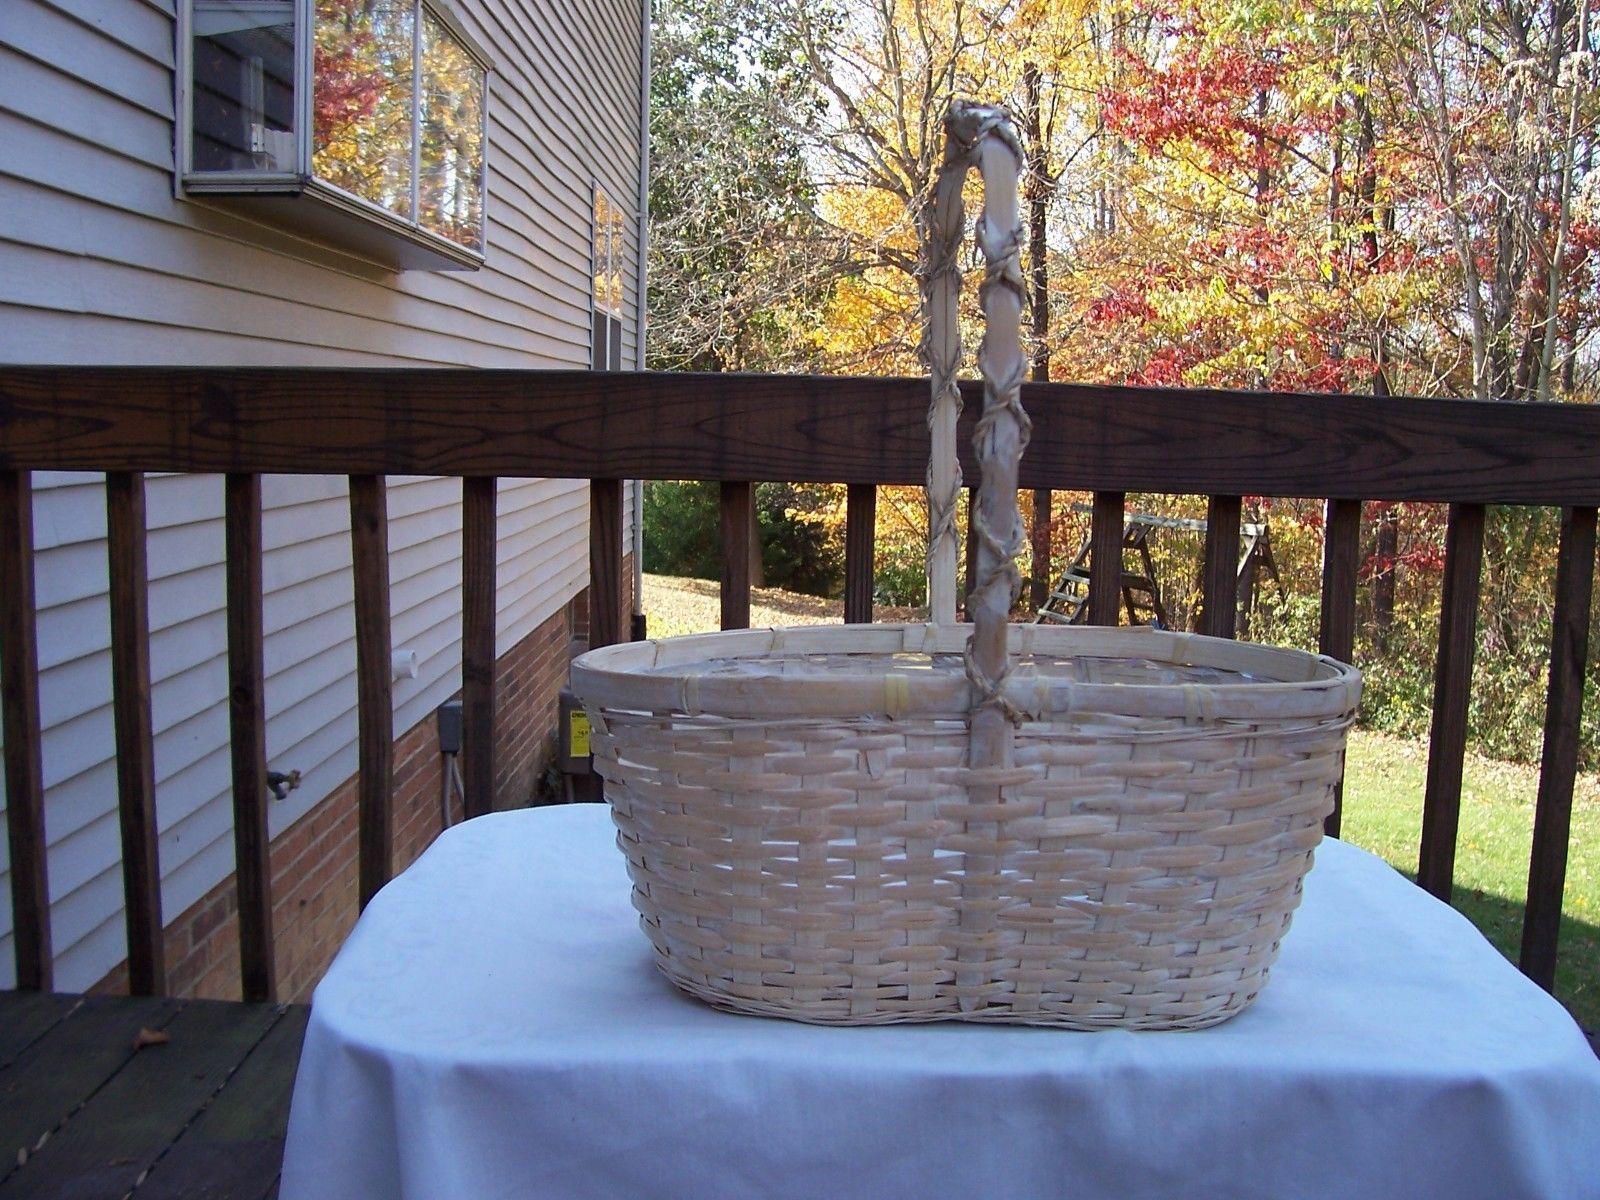 Ivory Basket with plastic liner - $16.89